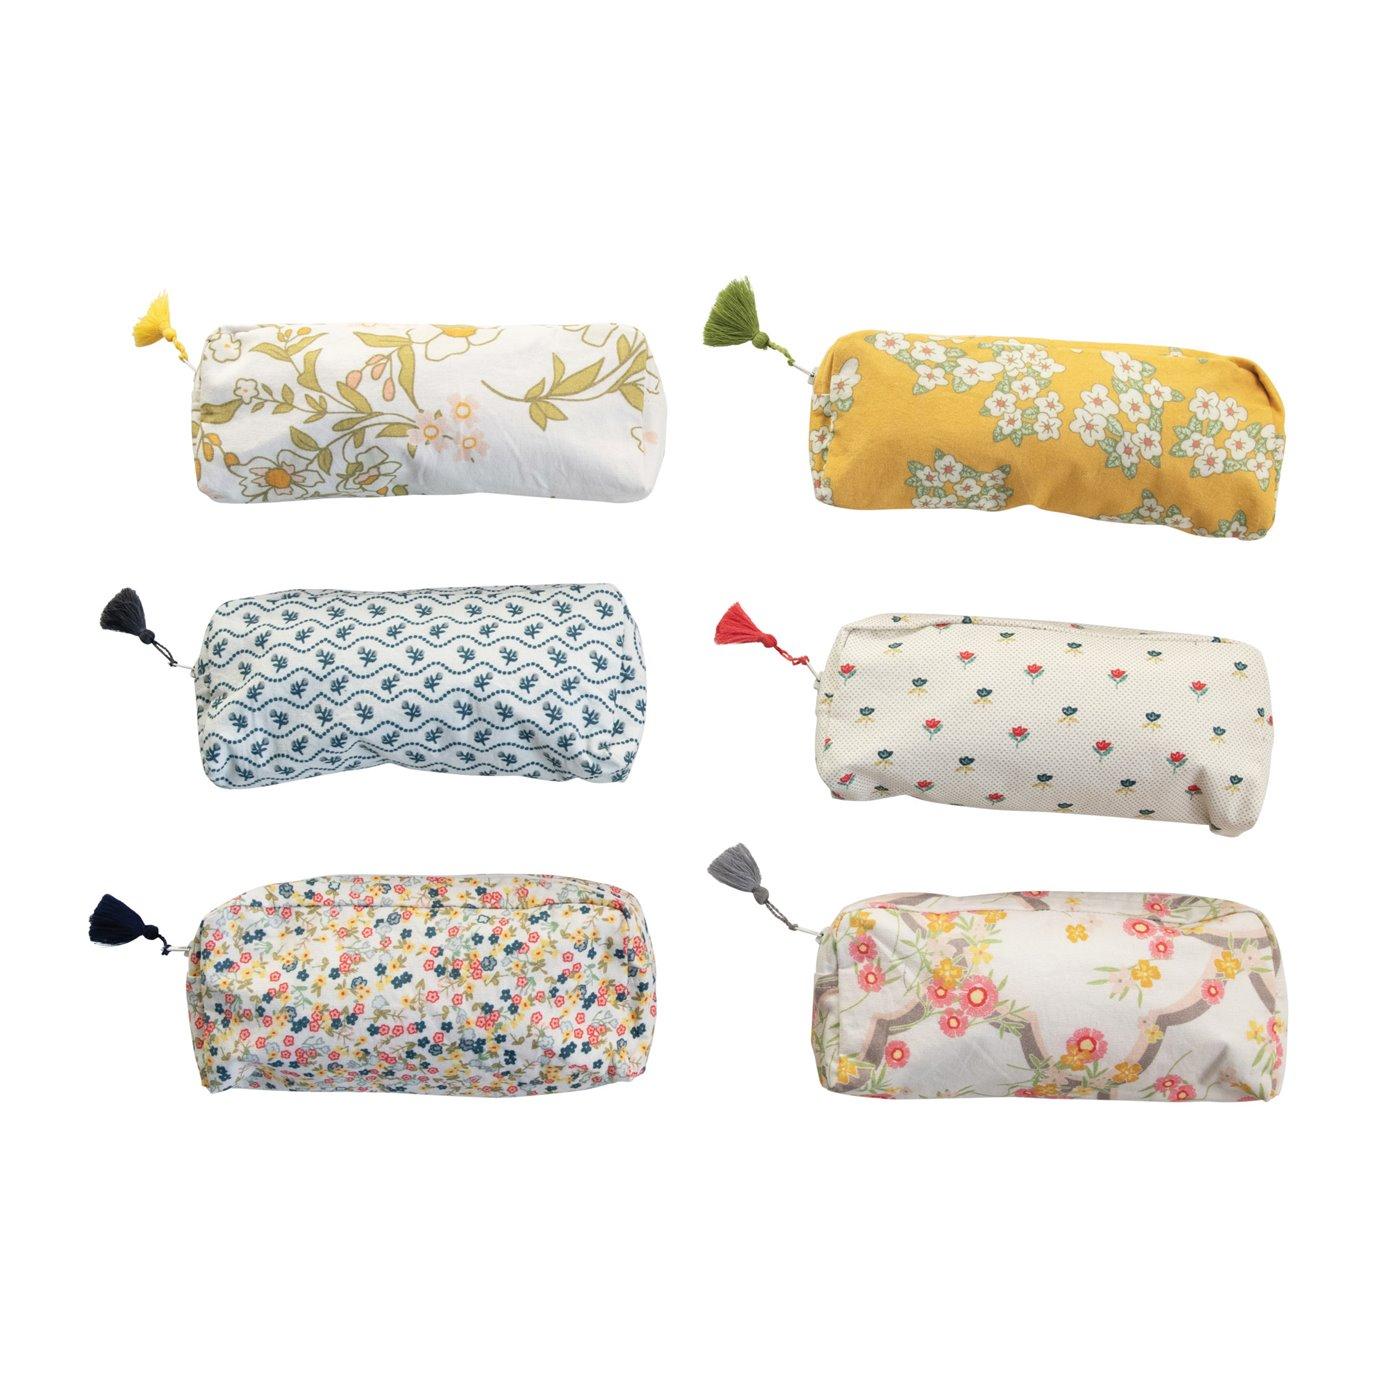 Cotton Printed Mandi Zip Pouch w/ Tassel & Interior Coating, 6 Styles ©